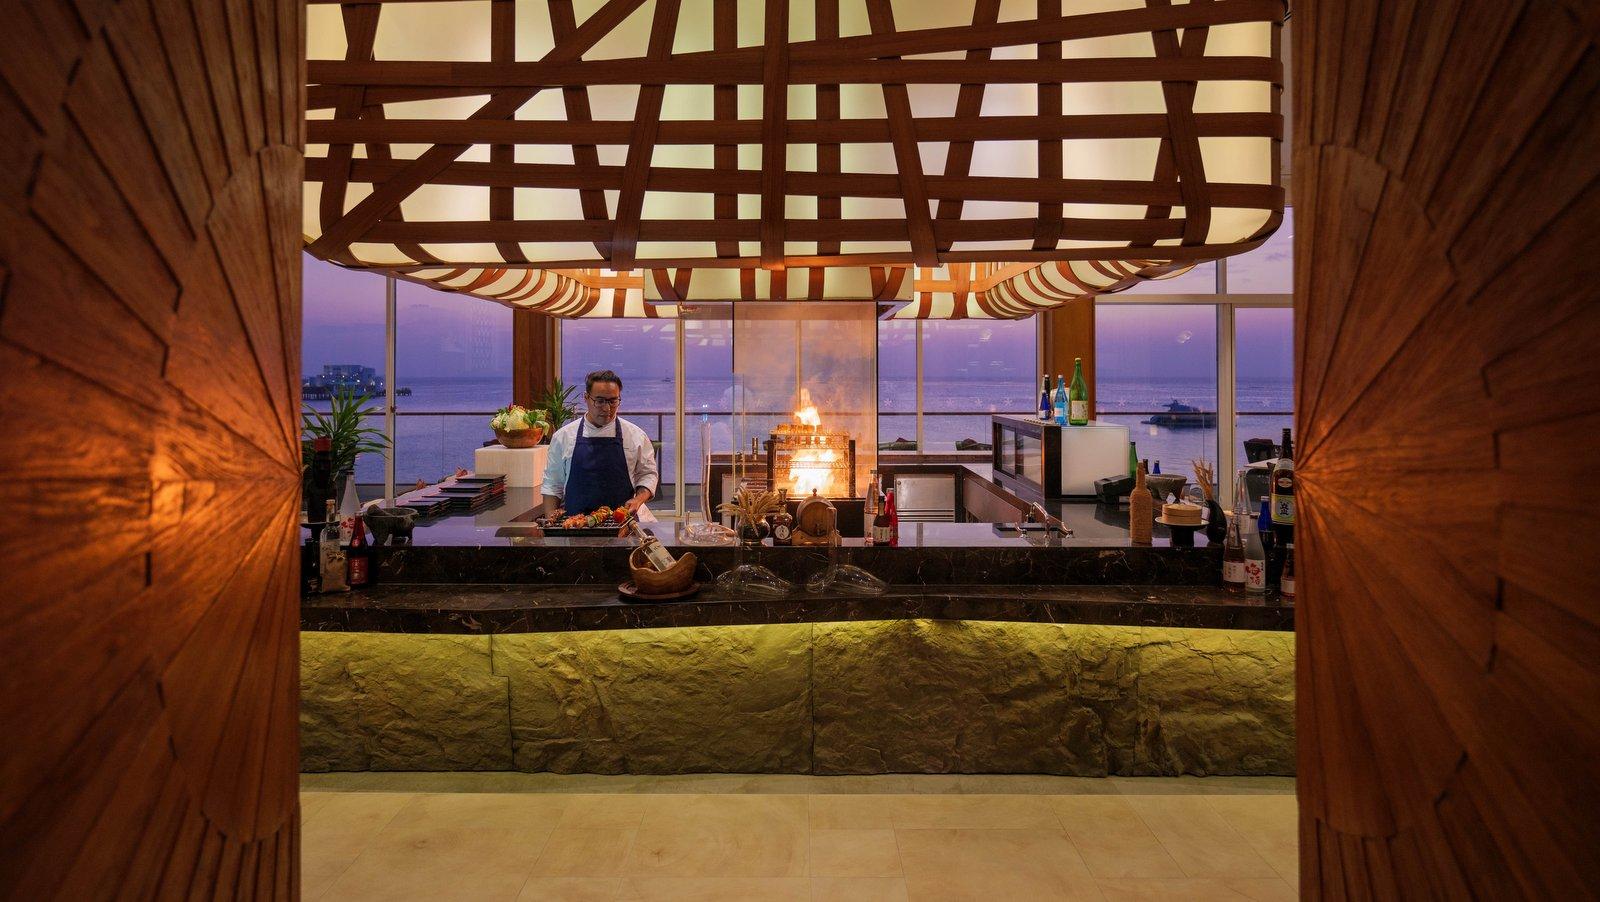 Мальдивы, отель LUX North Male Atoll, ресторан INTI